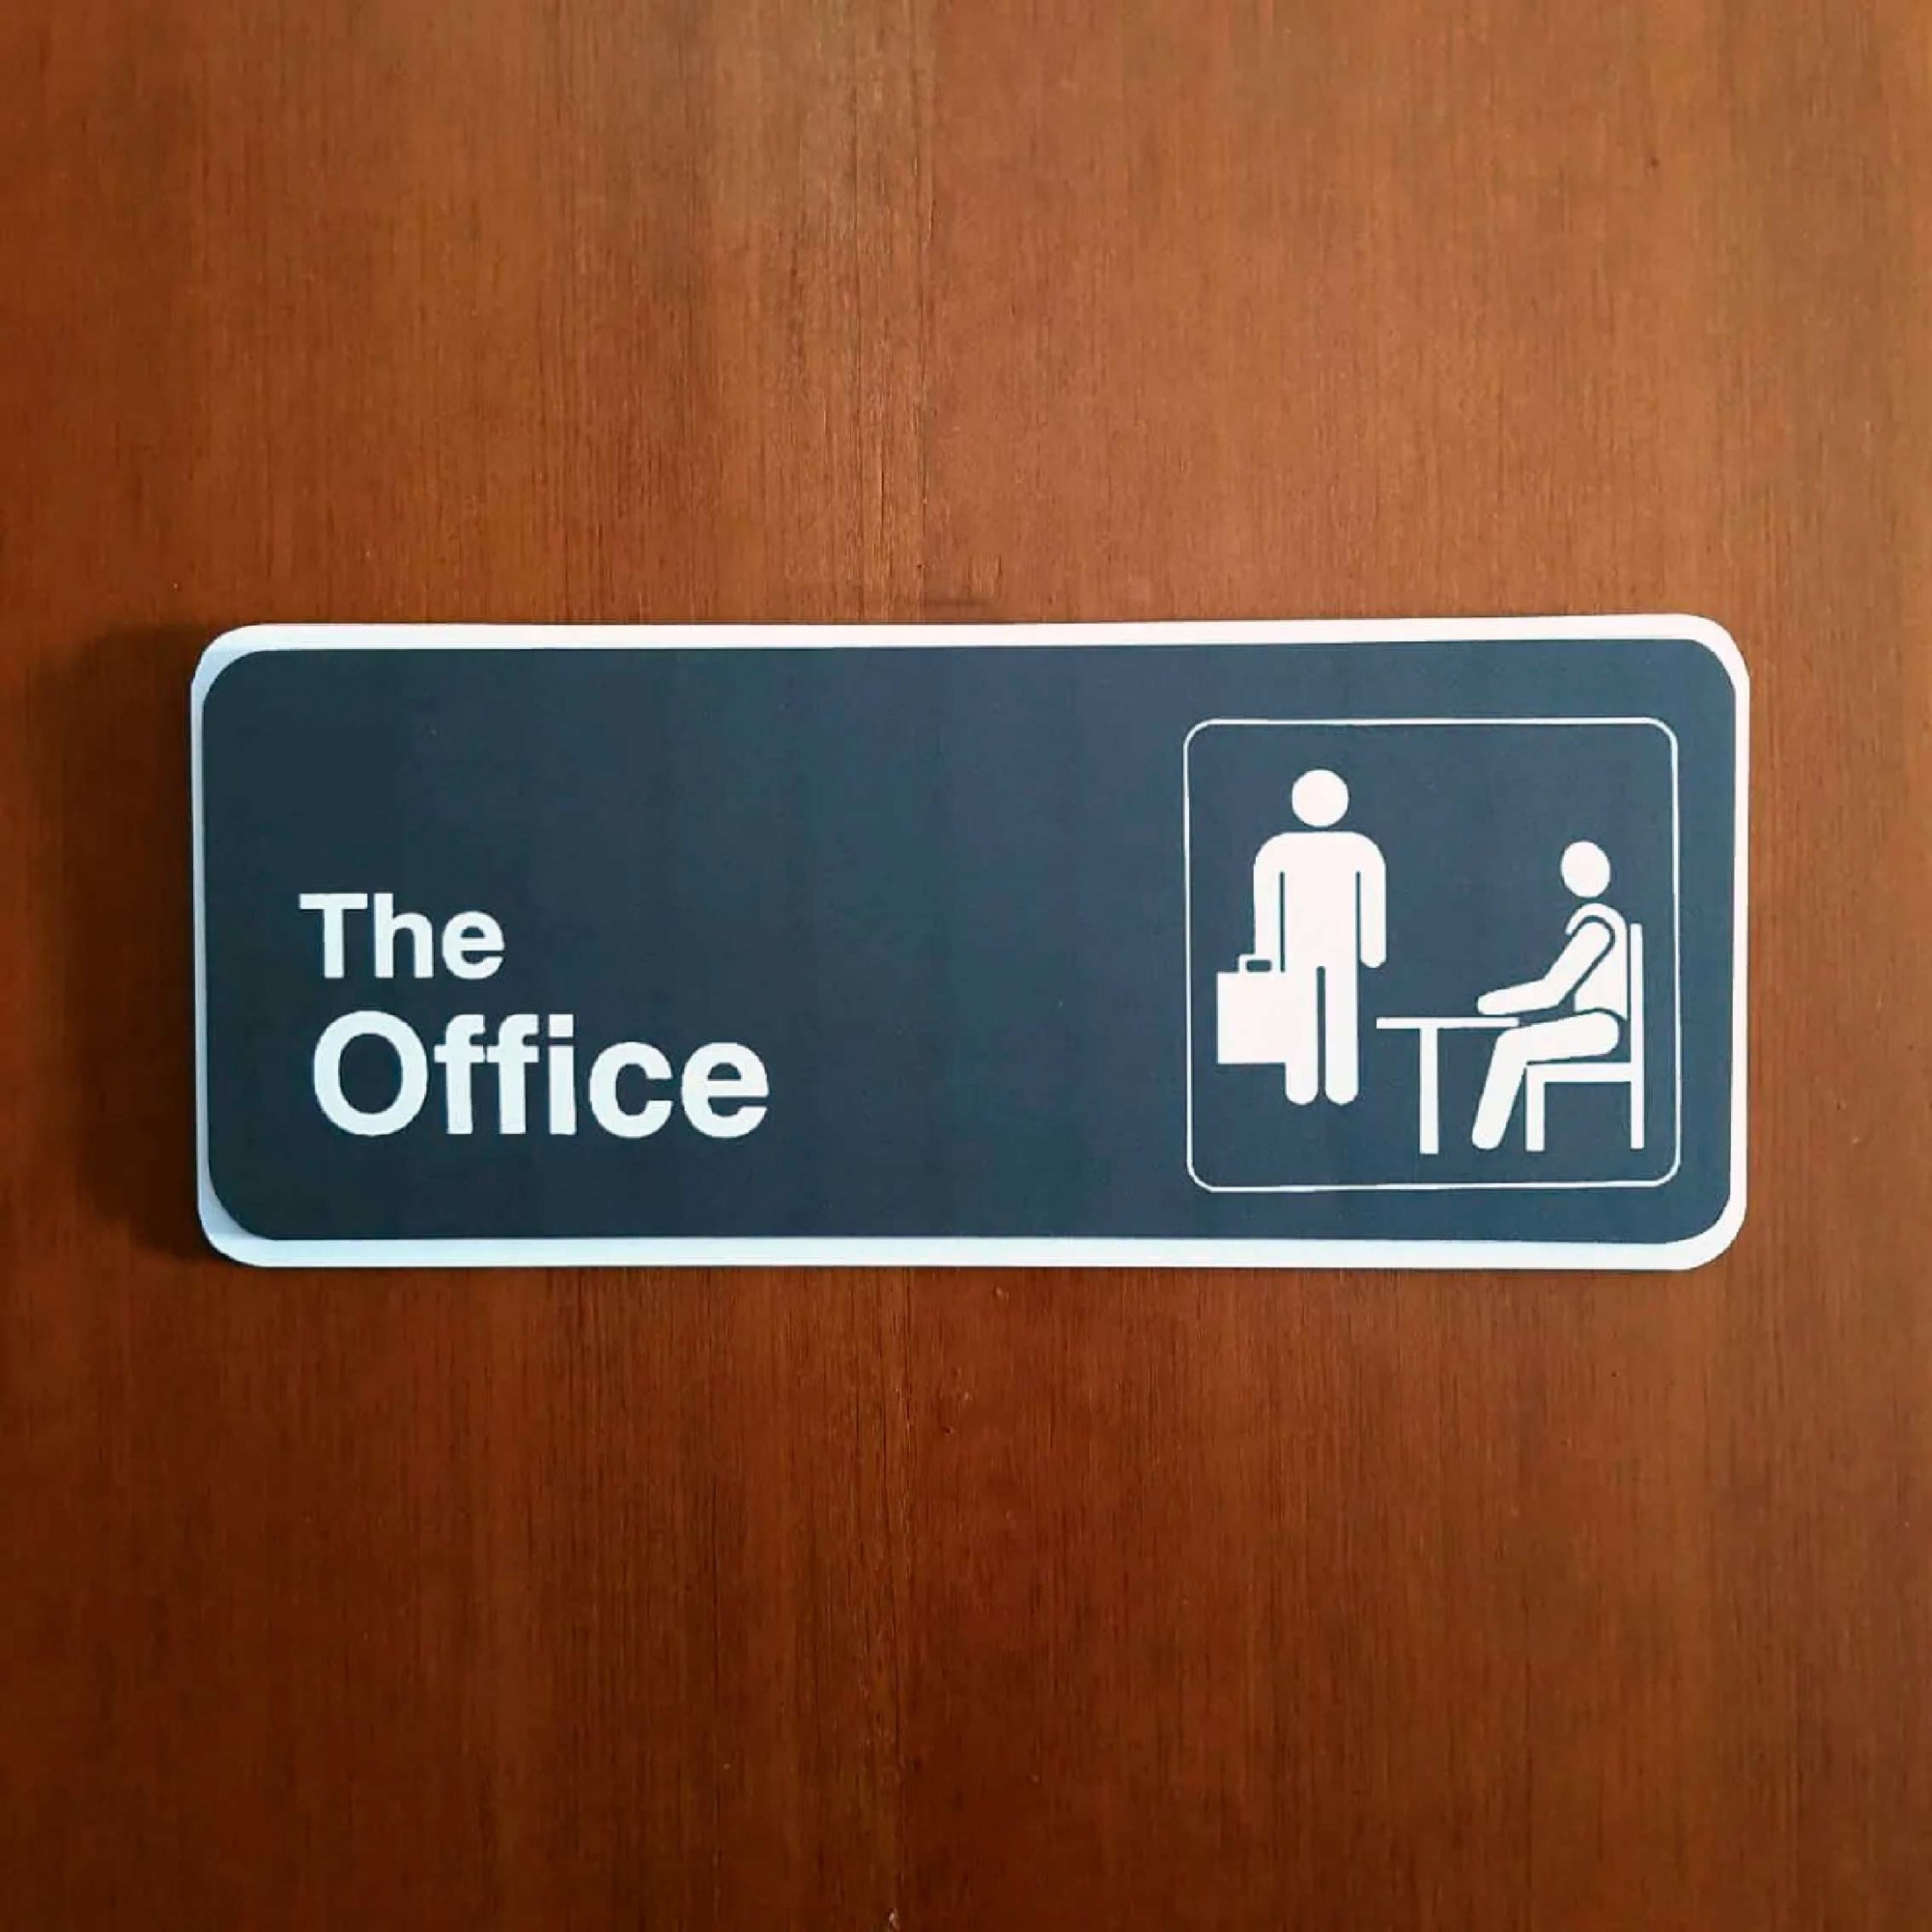 Kit The Office Placa + Camiseta + Caneca